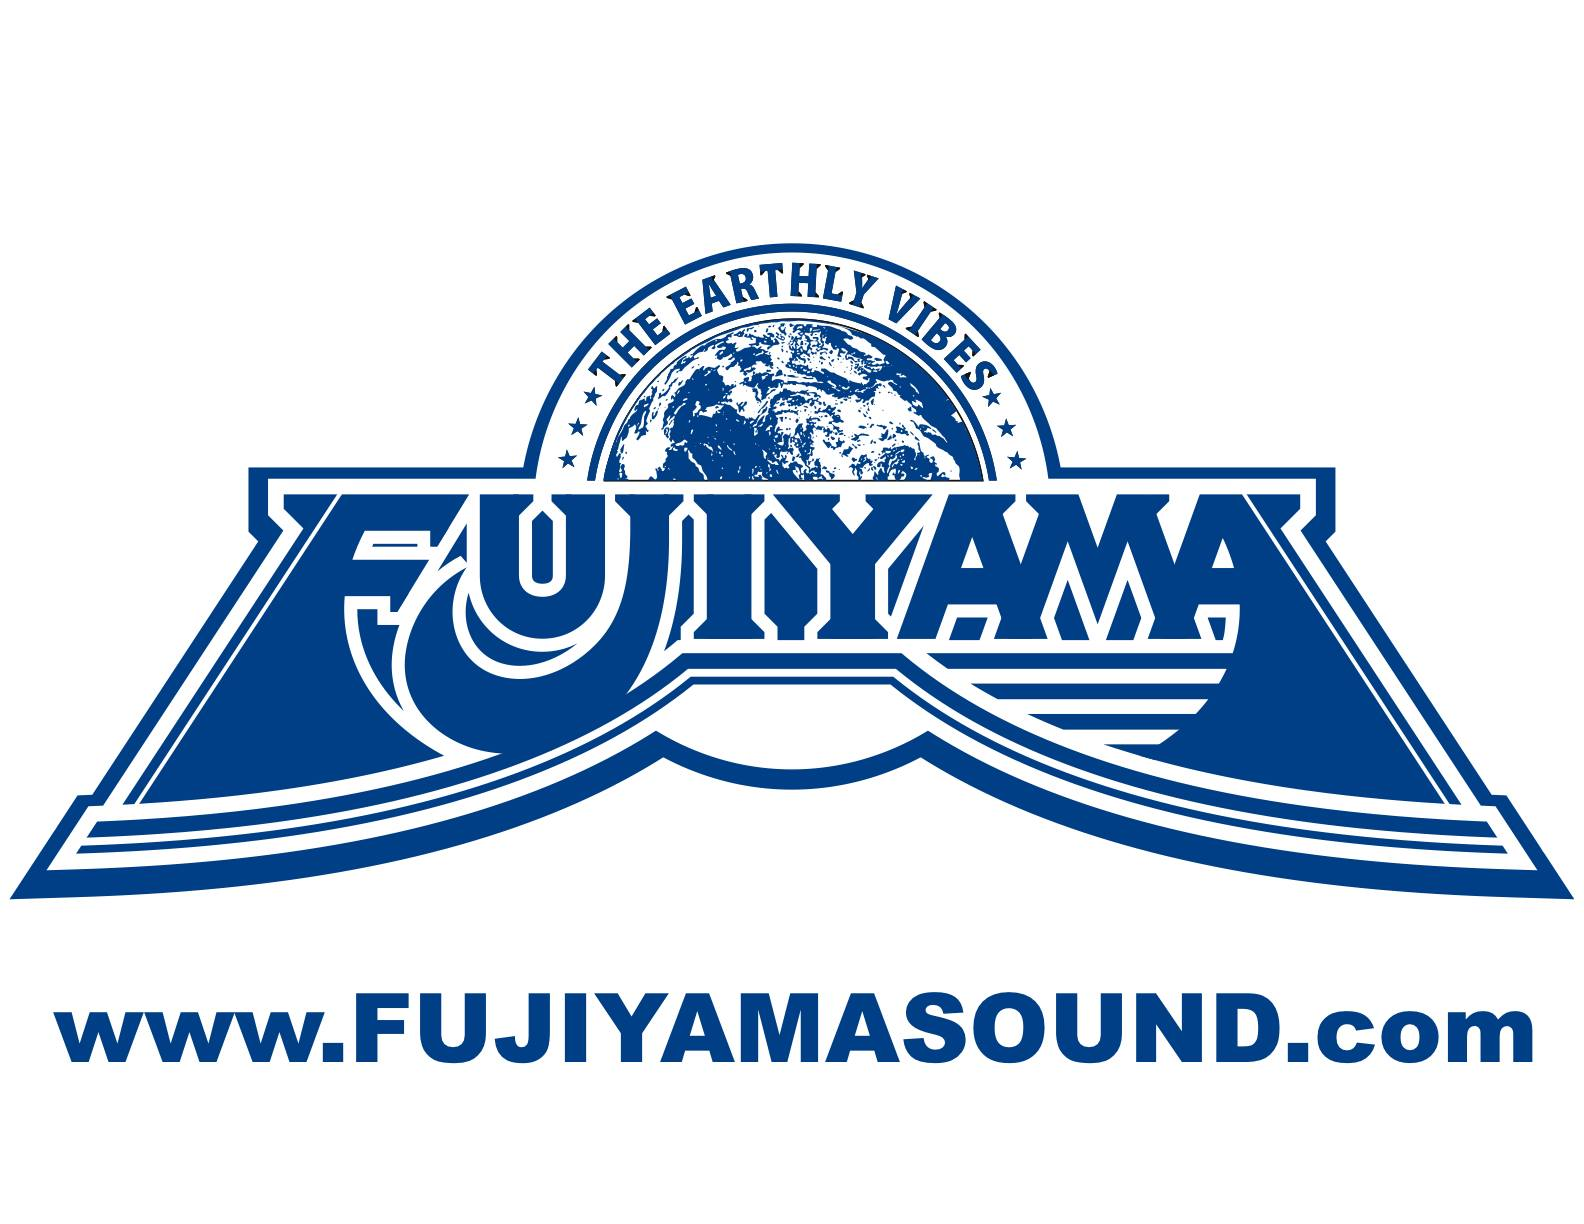 FUJIYAMA the earthly vibes